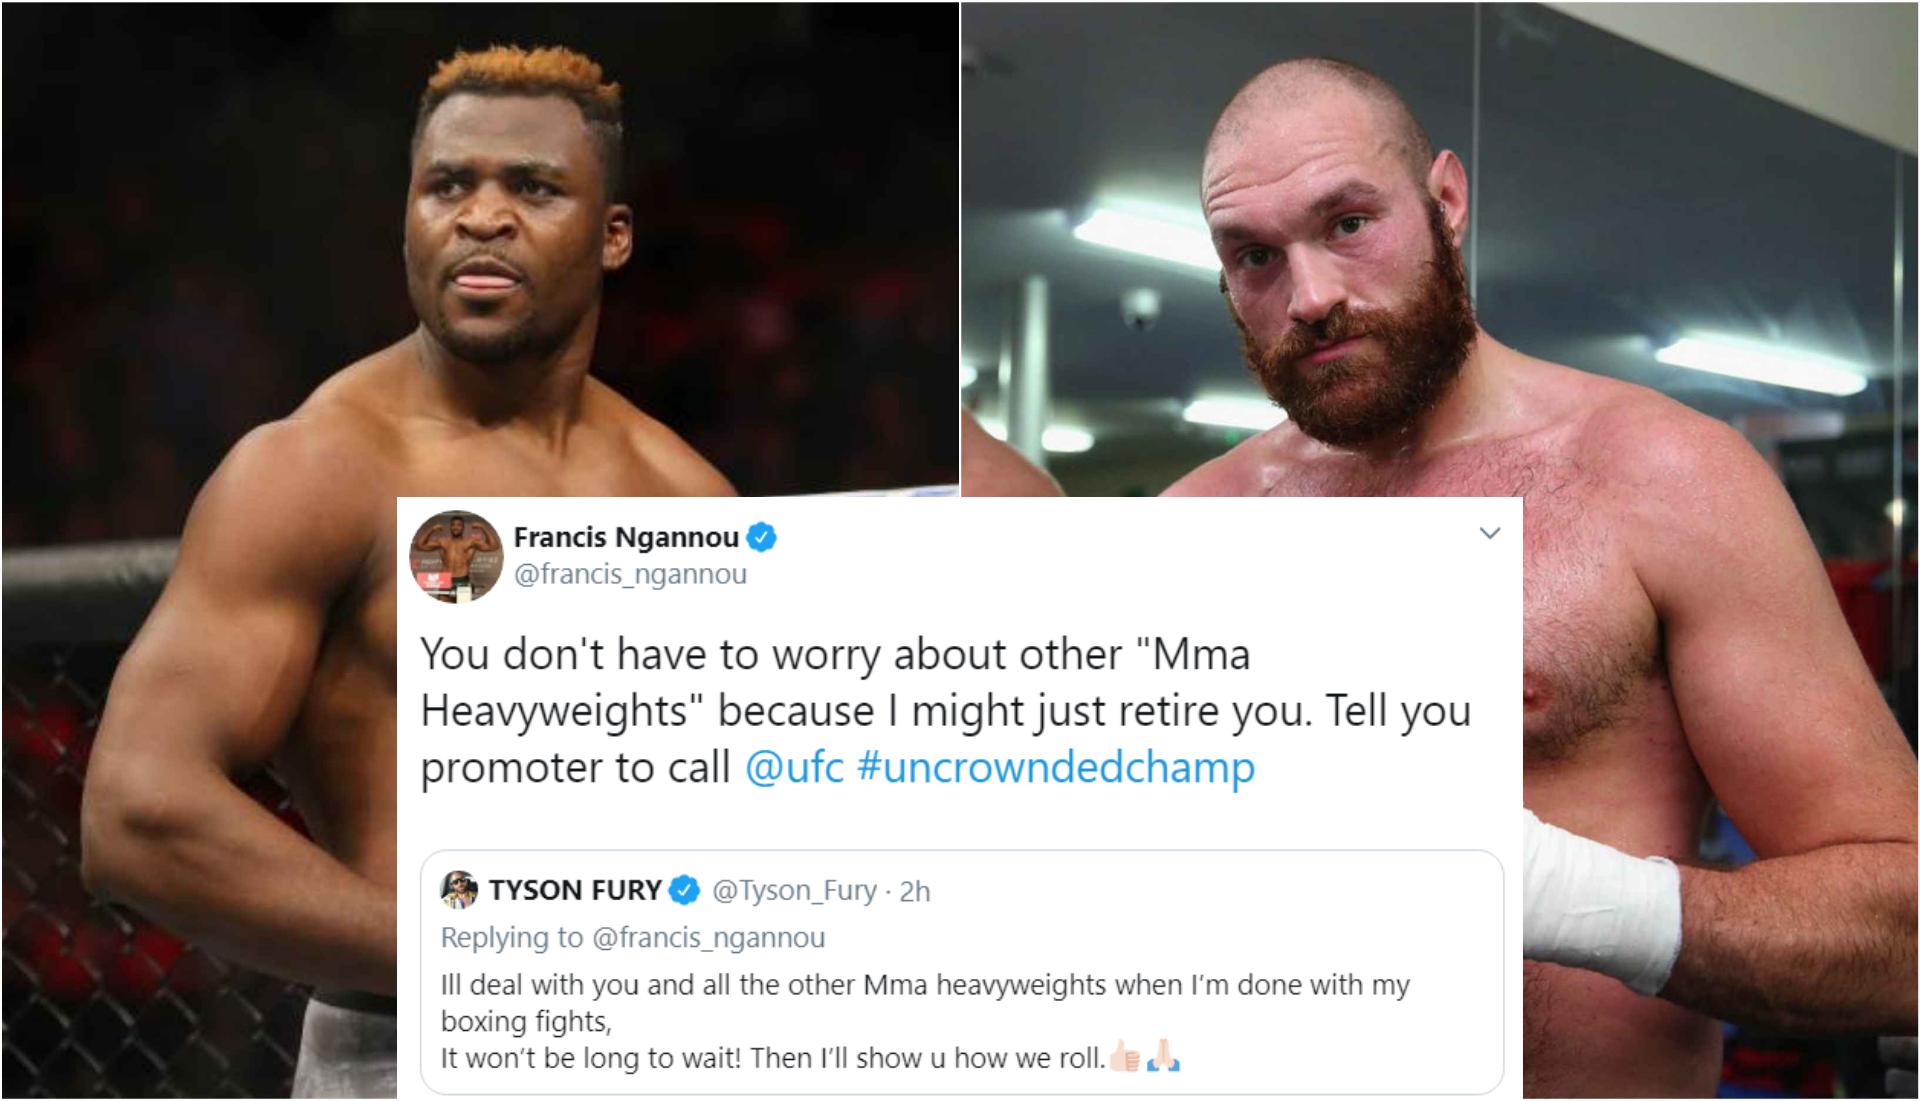 Francis Ngannou says he might retire Tyson Fury - Ngannou